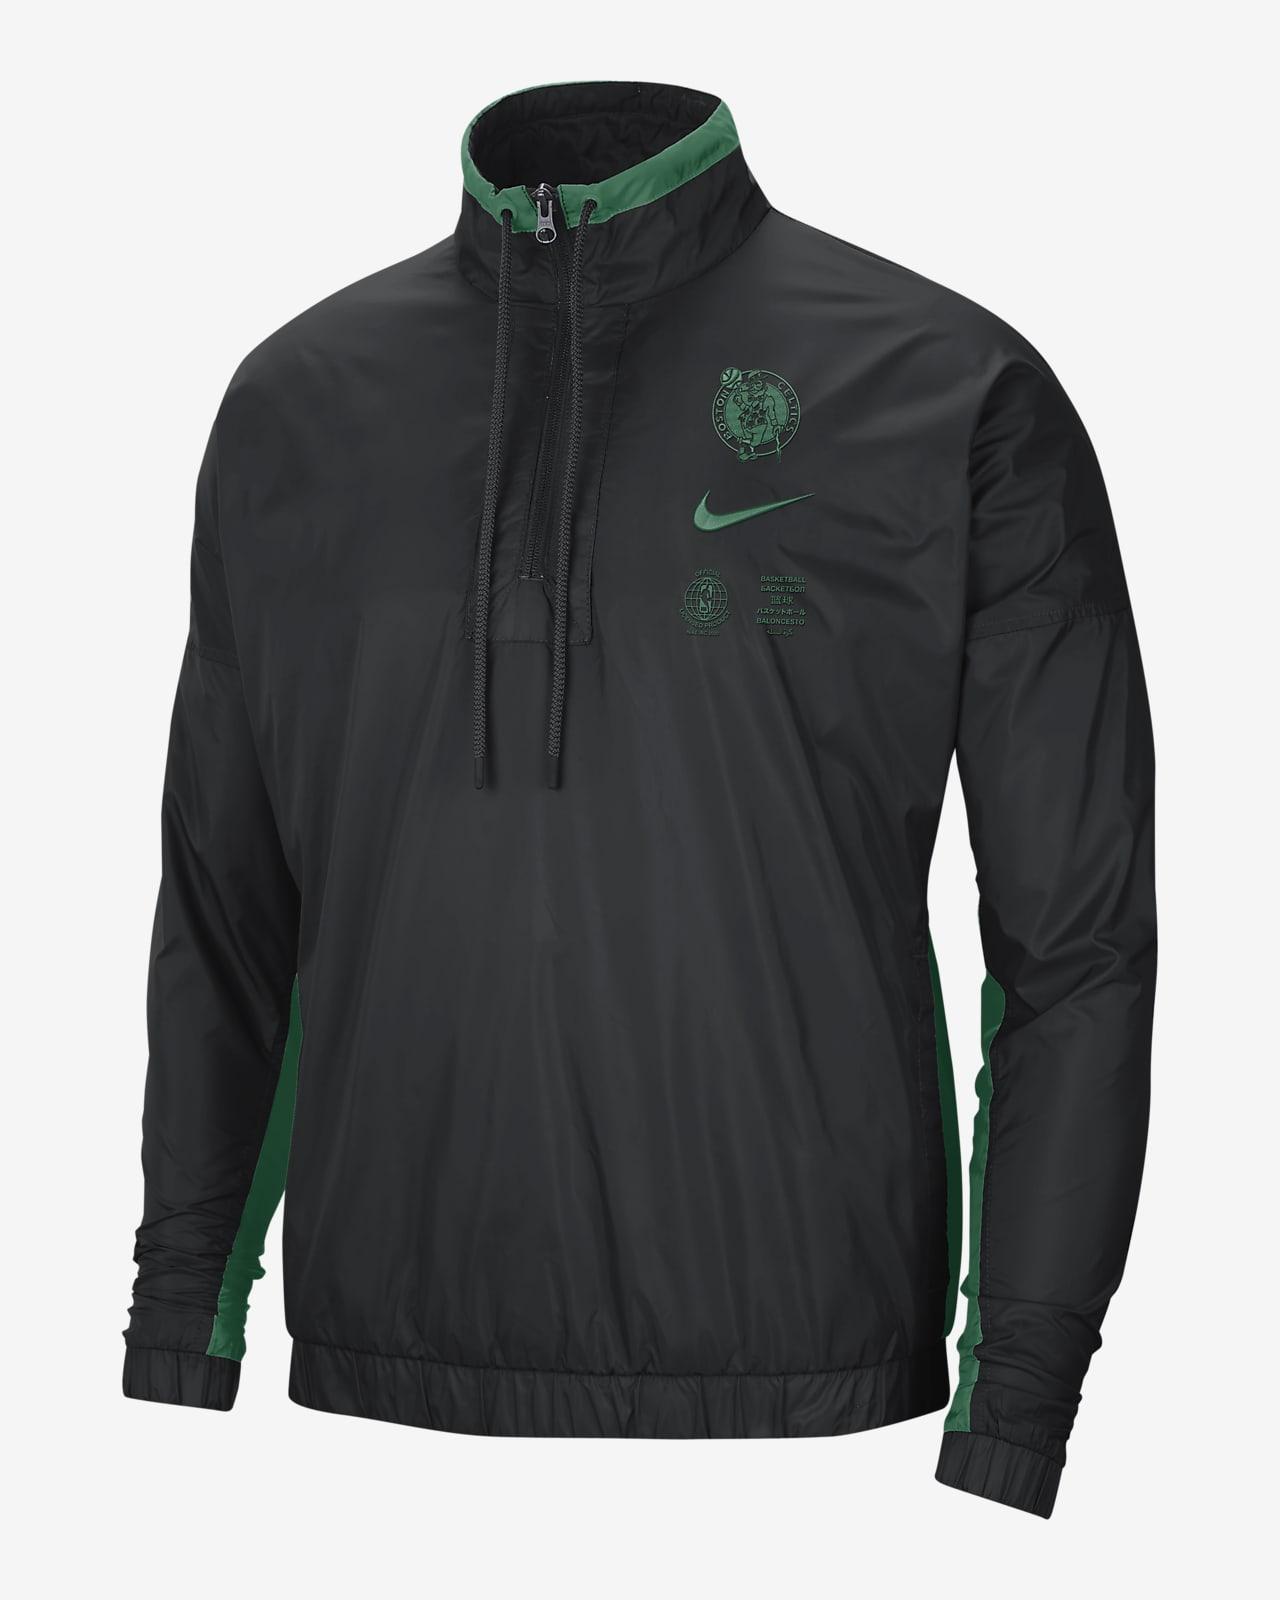 Boston Celtics Courtside Men's Nike NBA Tracksuit Jacket